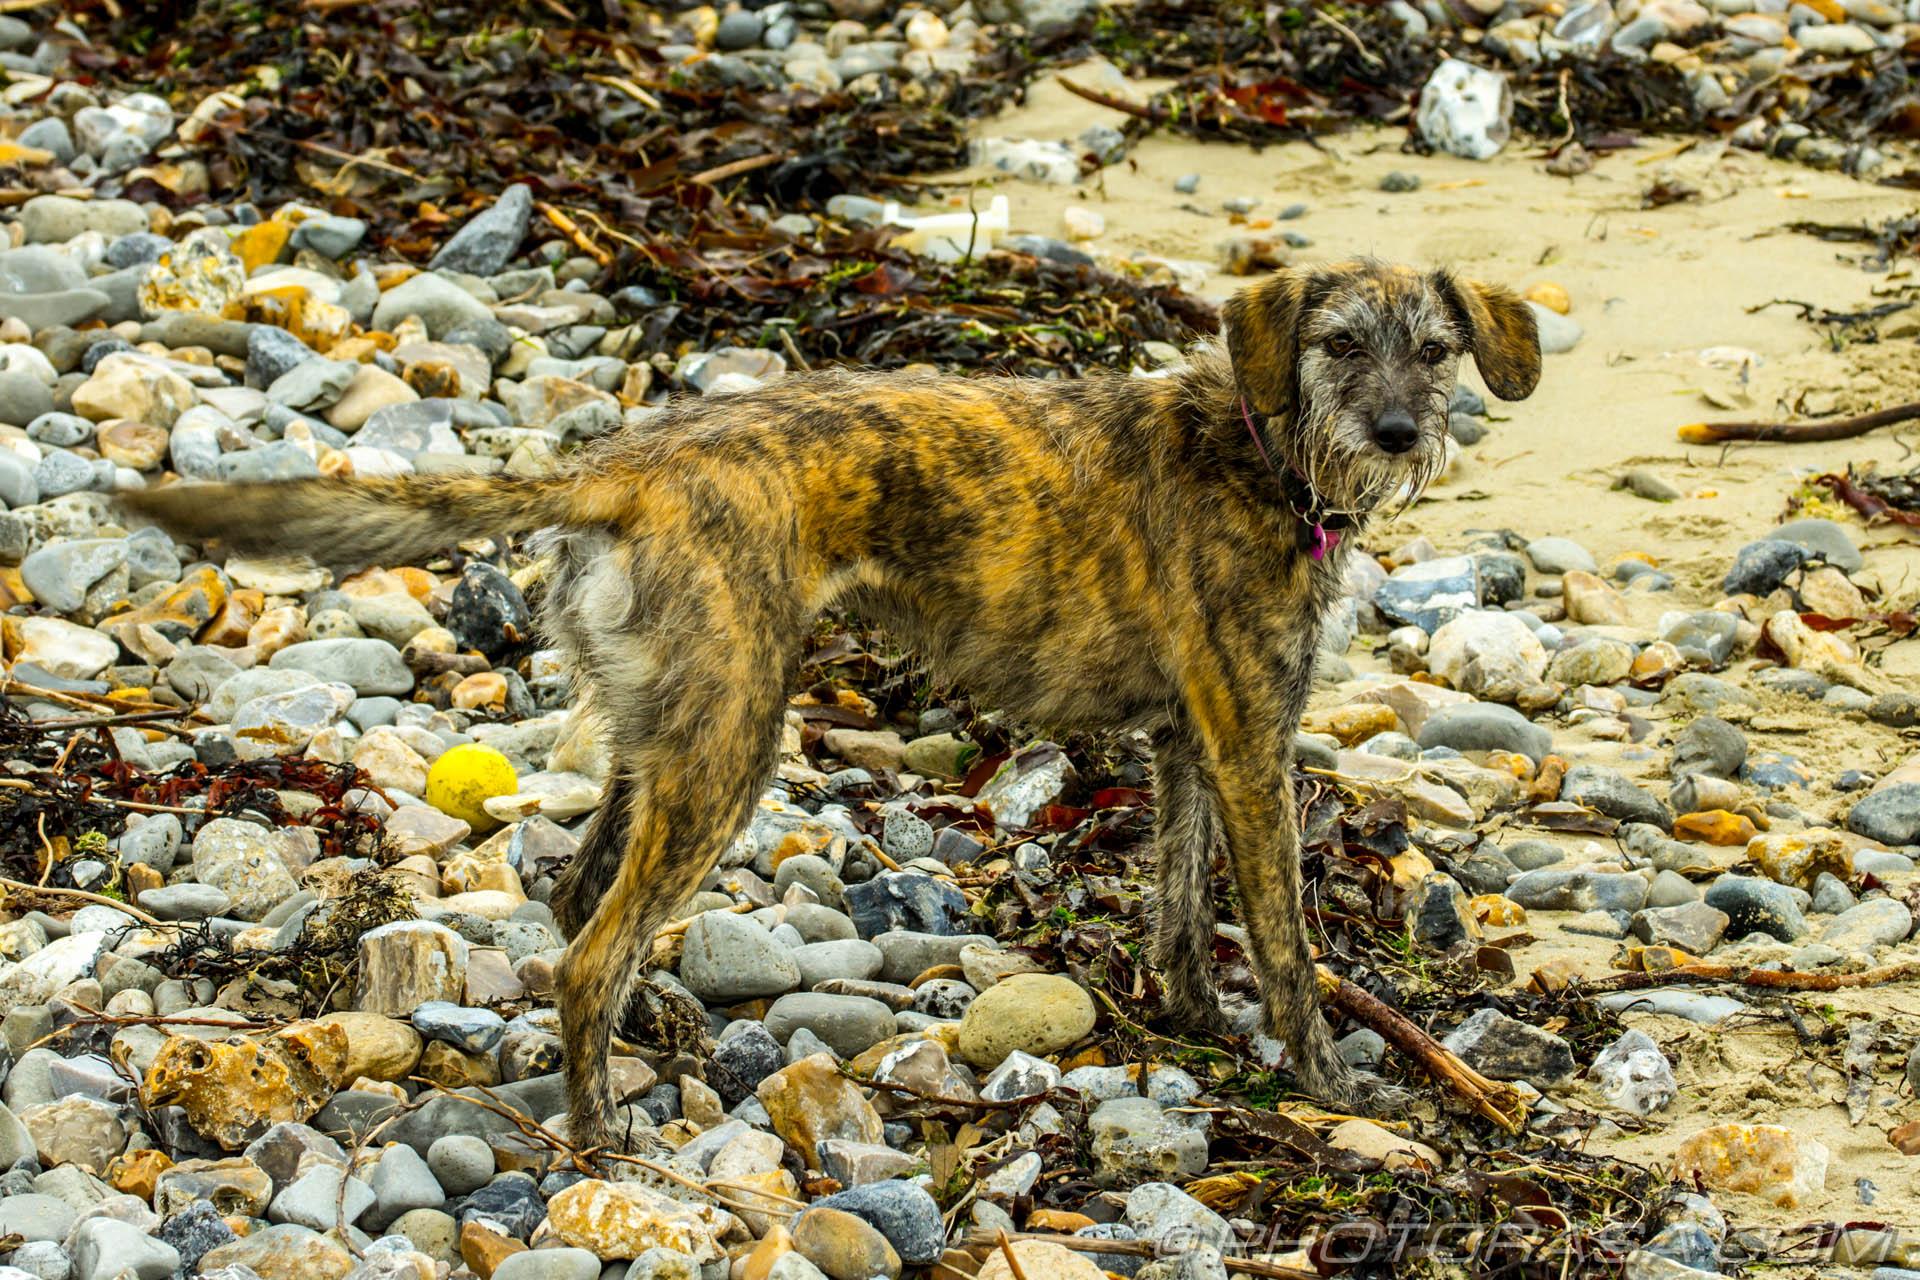 https://photorasa.com/dog-sand/amongst-the-rocks-and-sand-and-sticks-and-seaweed/